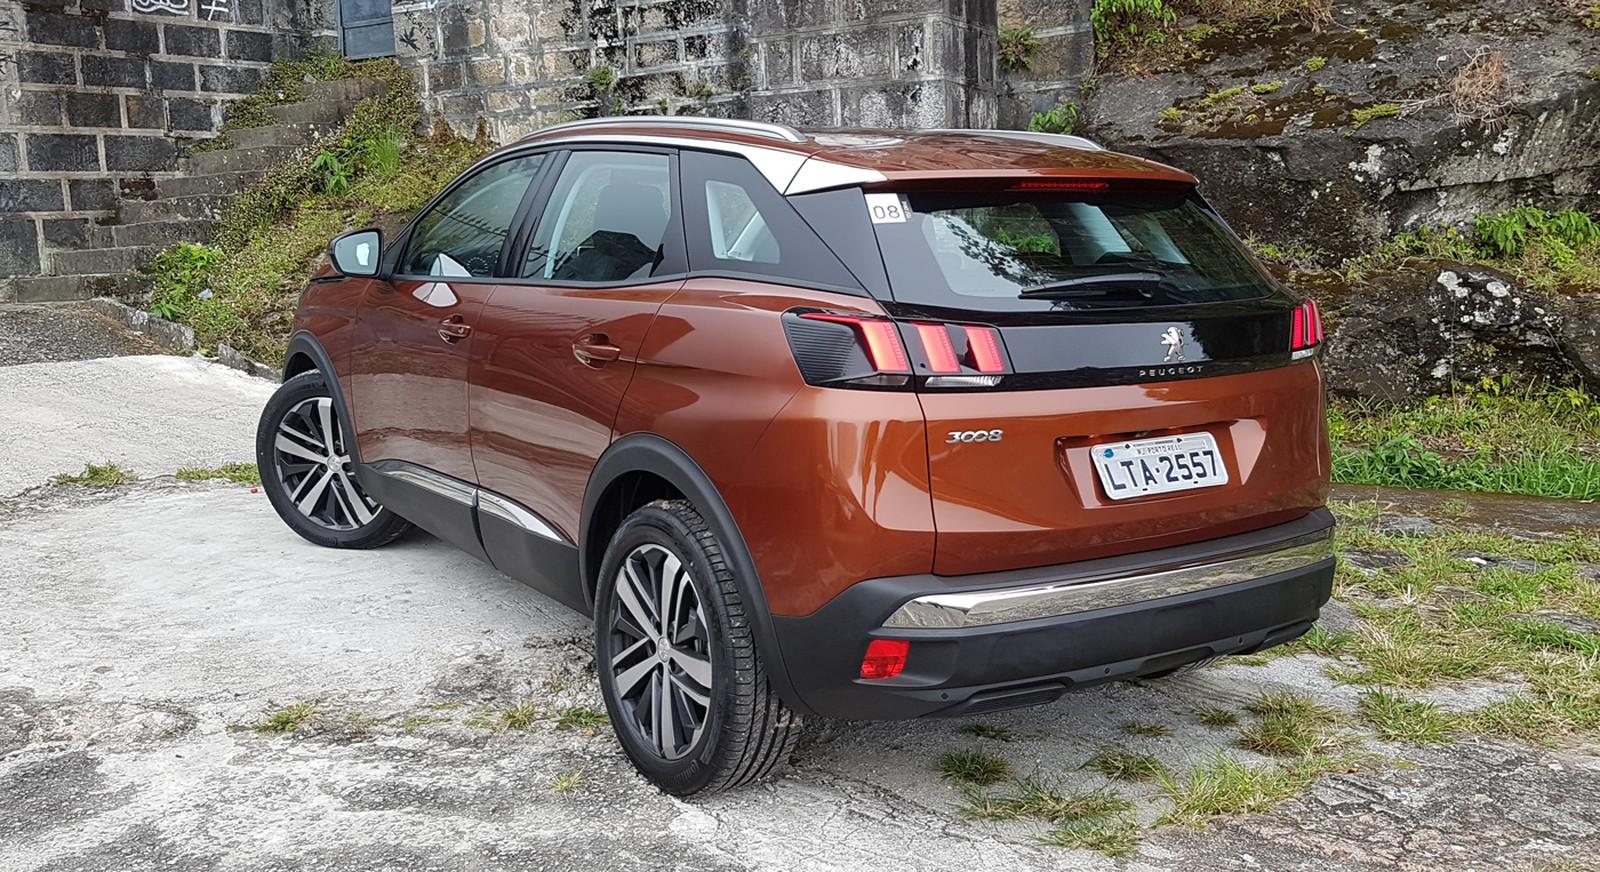 Peugeot confirma 5008 e estuda futura picape para o Brasil 20170620-111423